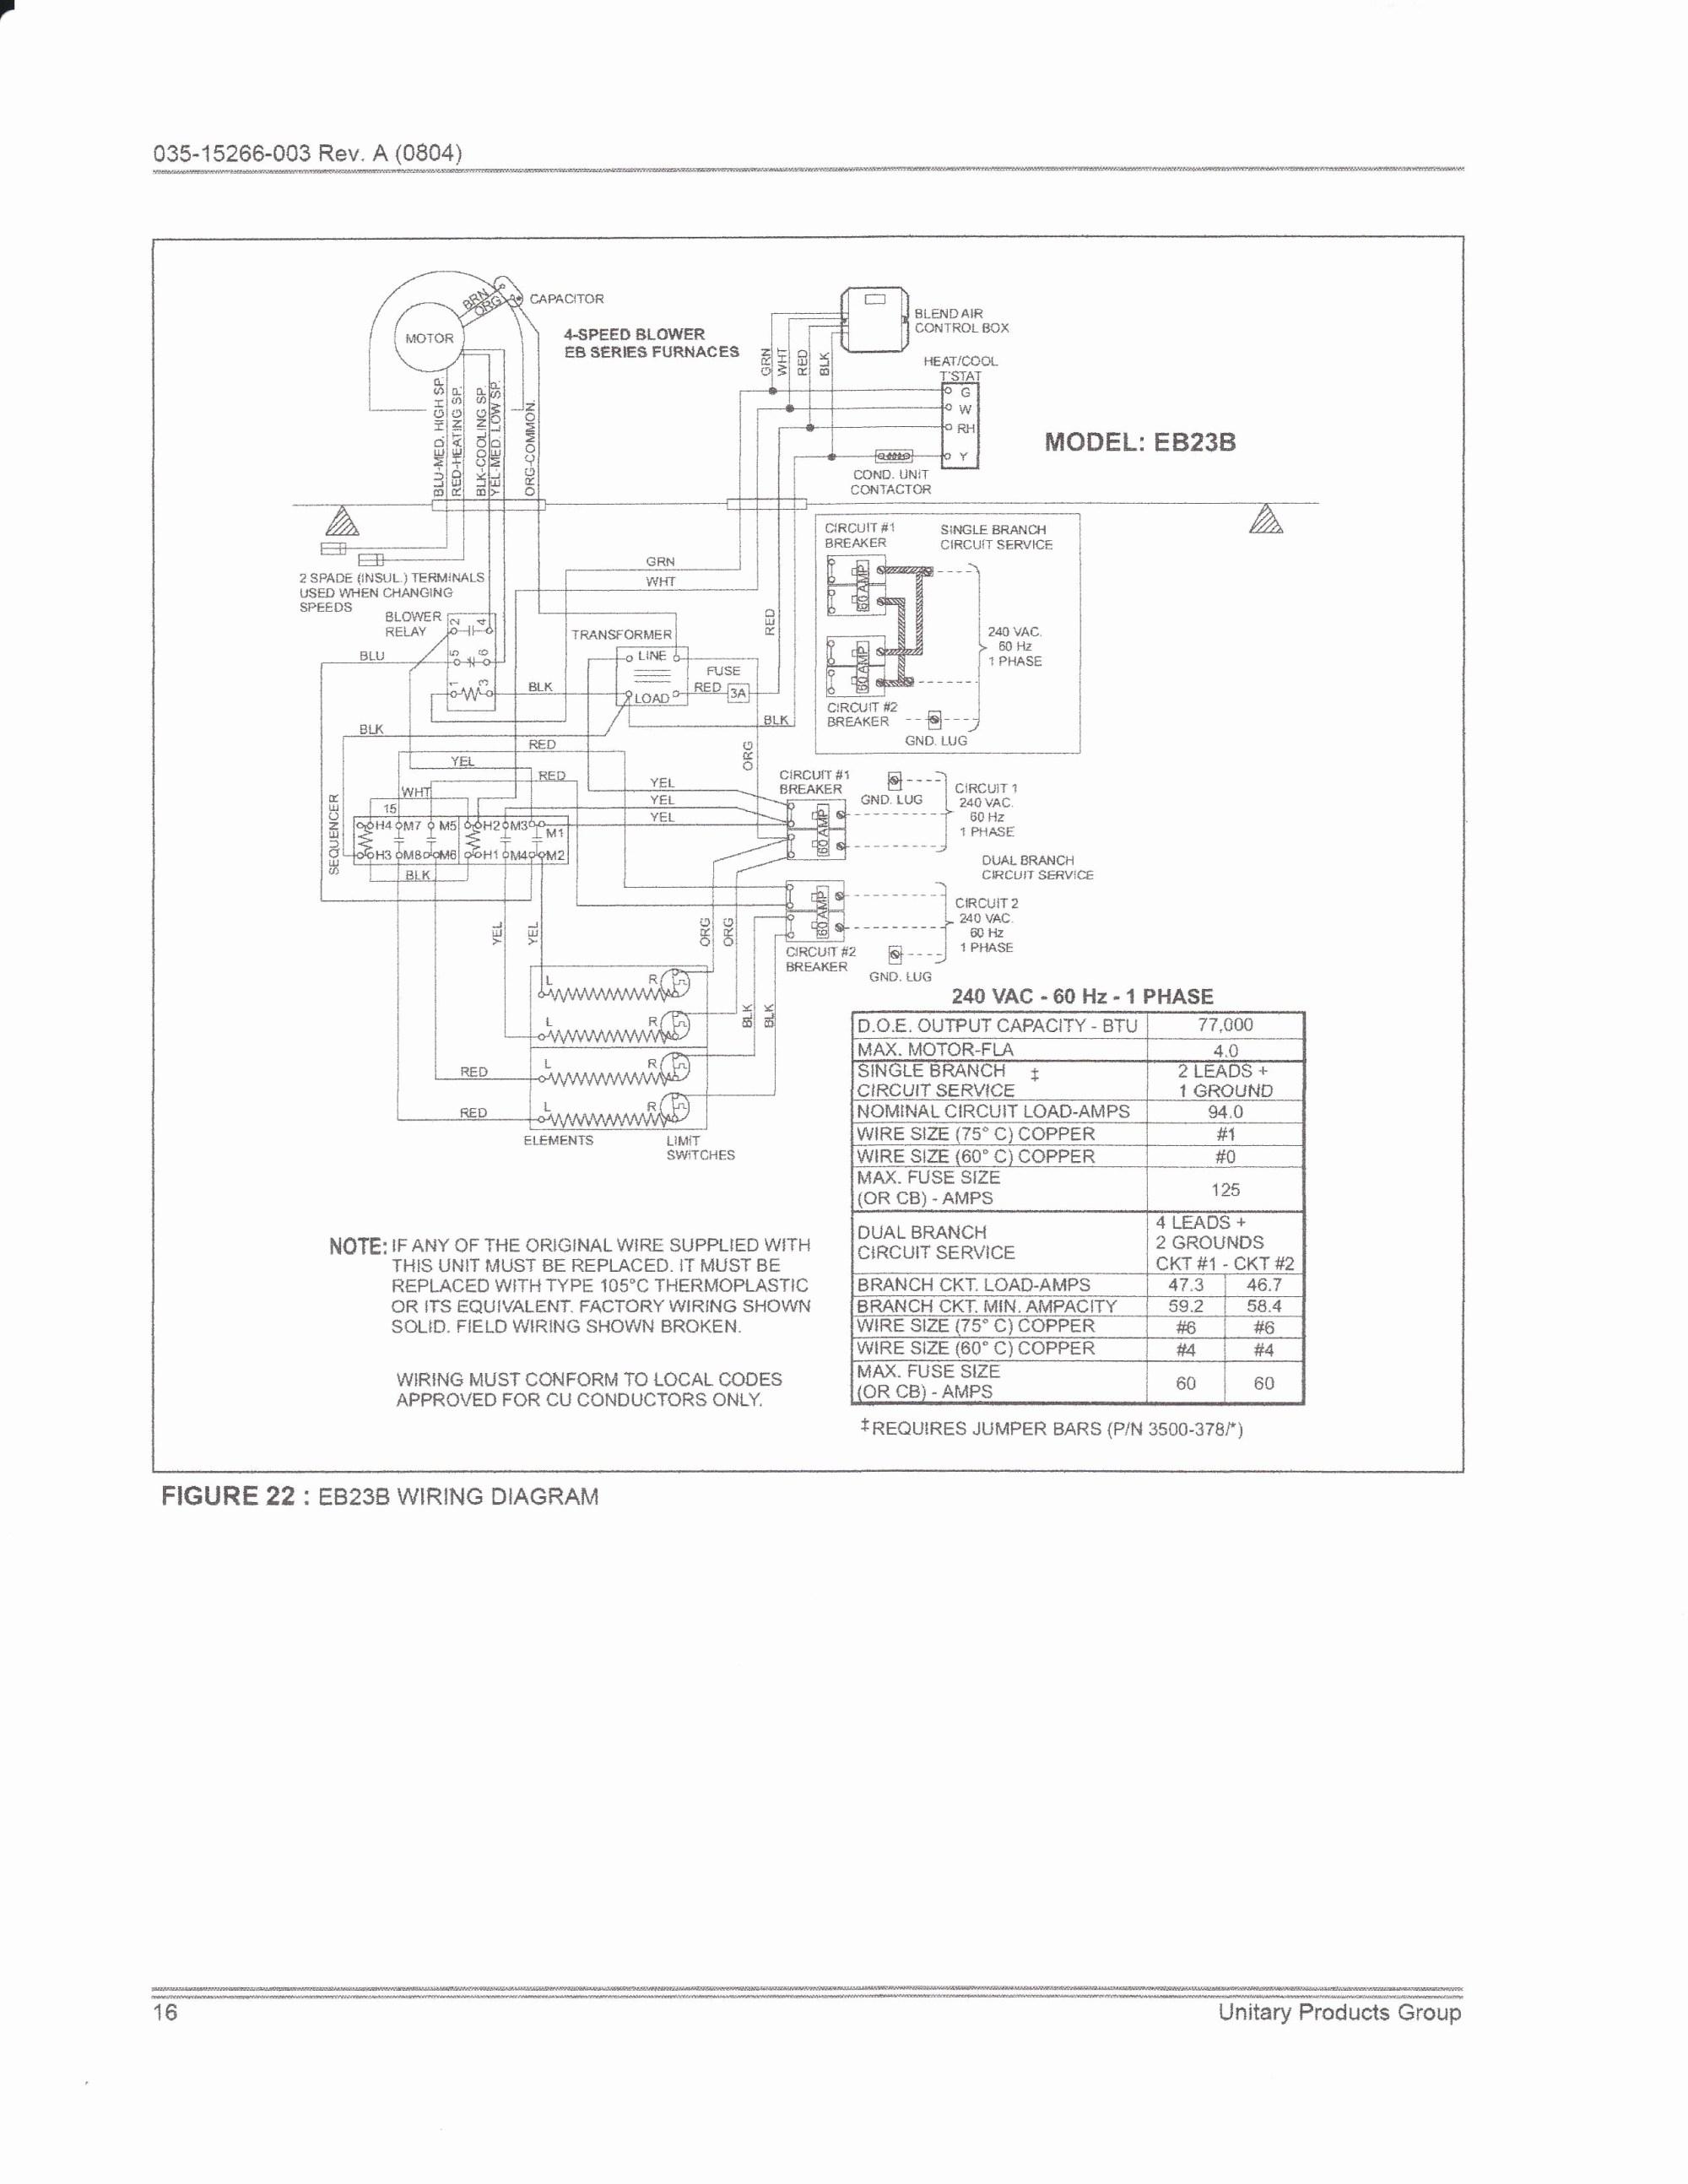 hight resolution of mars 10589 wiring diagram electric motors wiring librarymars blower motor 10587 wiring diagram wiring librarymars 10585